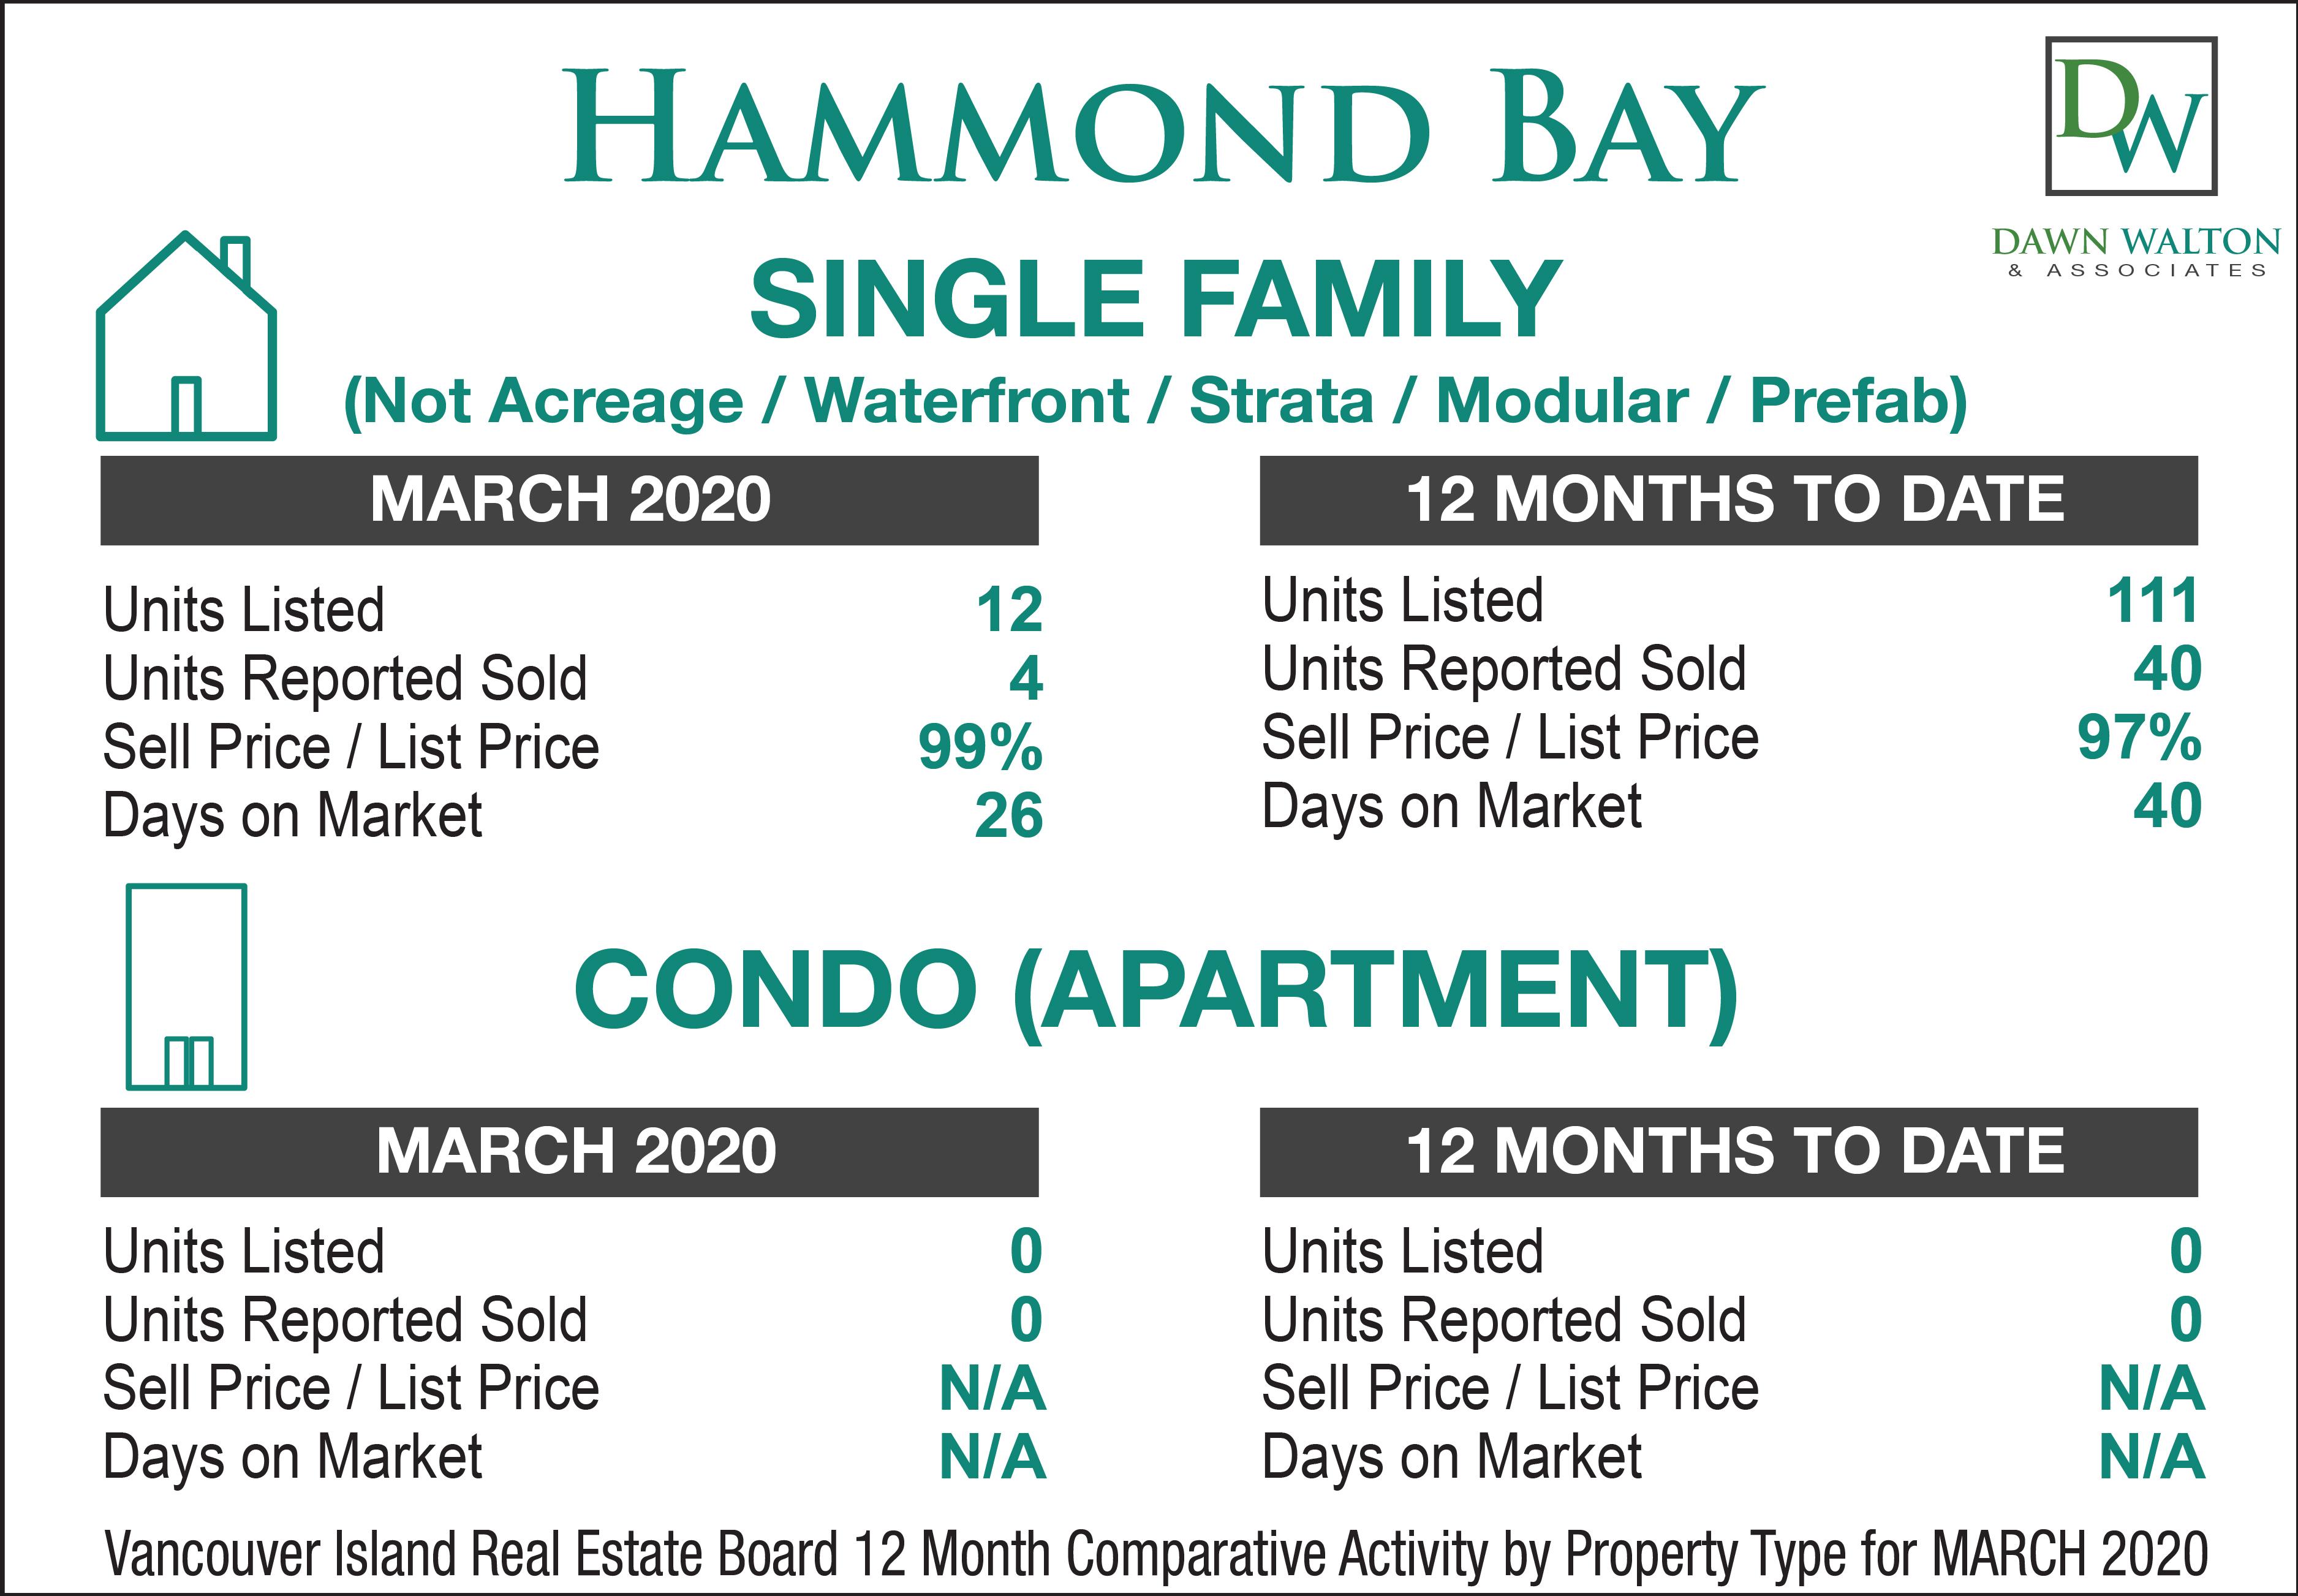 Hammond Bay Real Estate Market Stats March 2020 - Nanaimo Realtor Dawn Walton